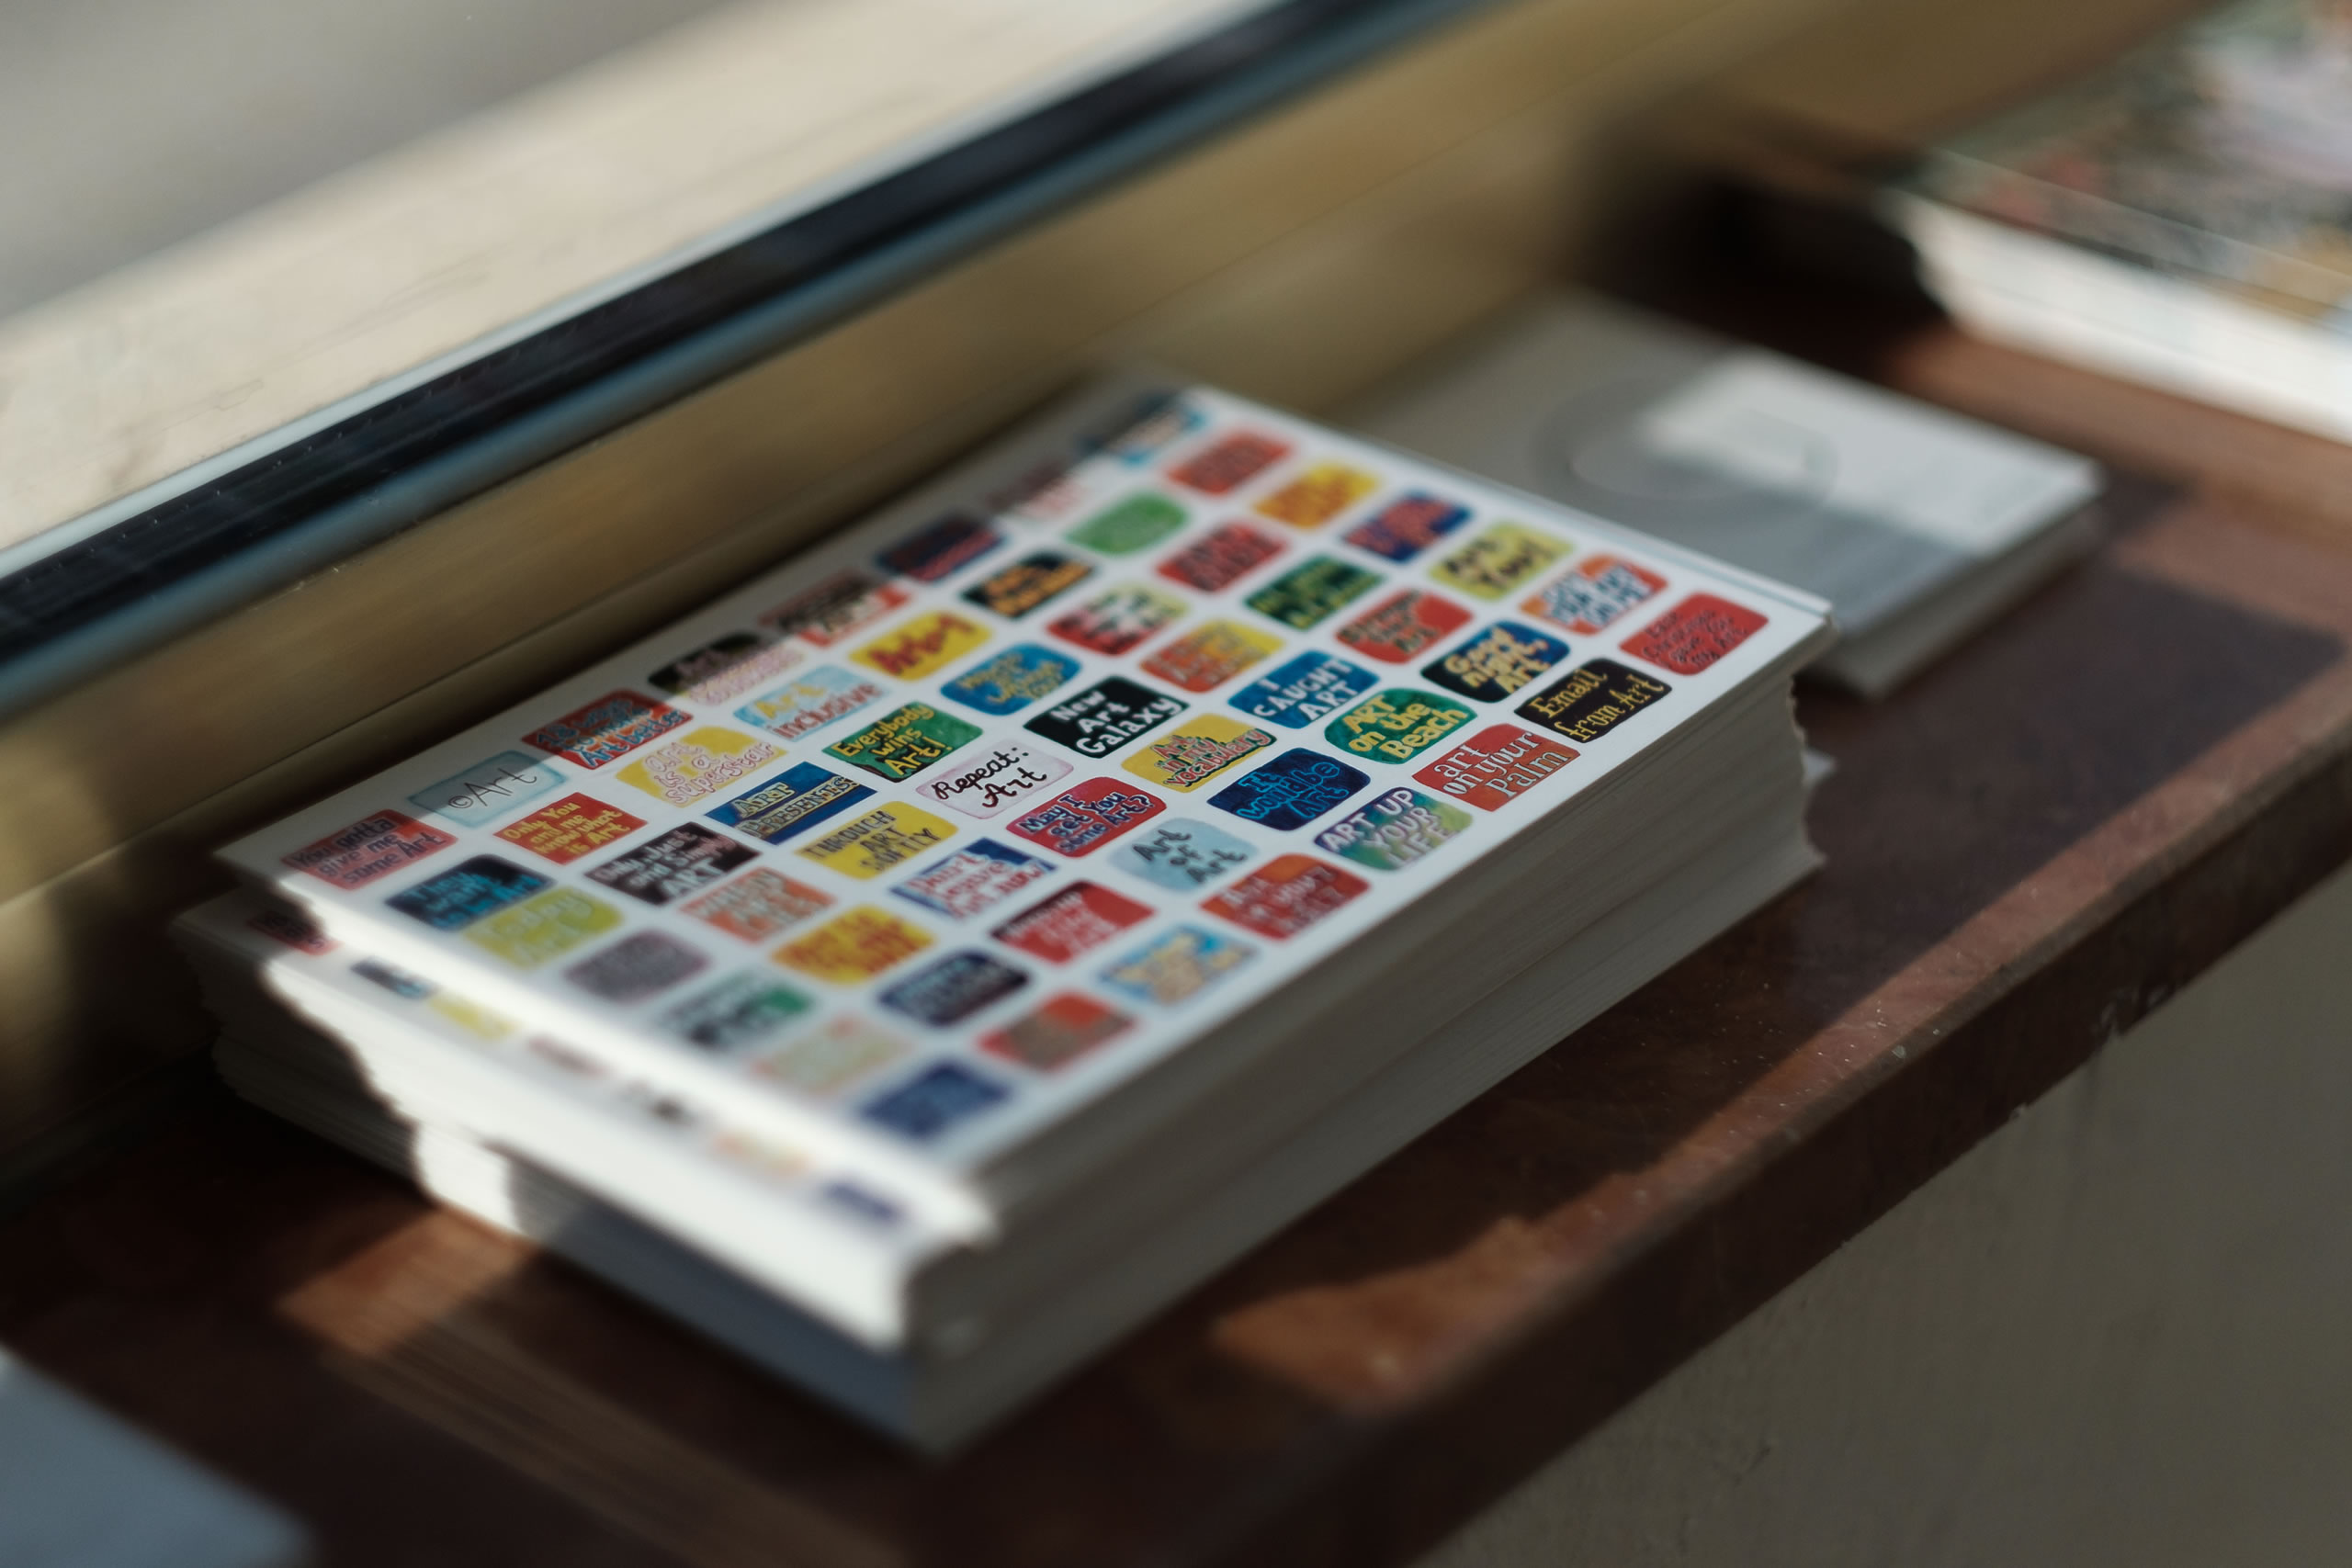 Einladungskarten | Foto: Manu Lasnik | Galerie3 Velden